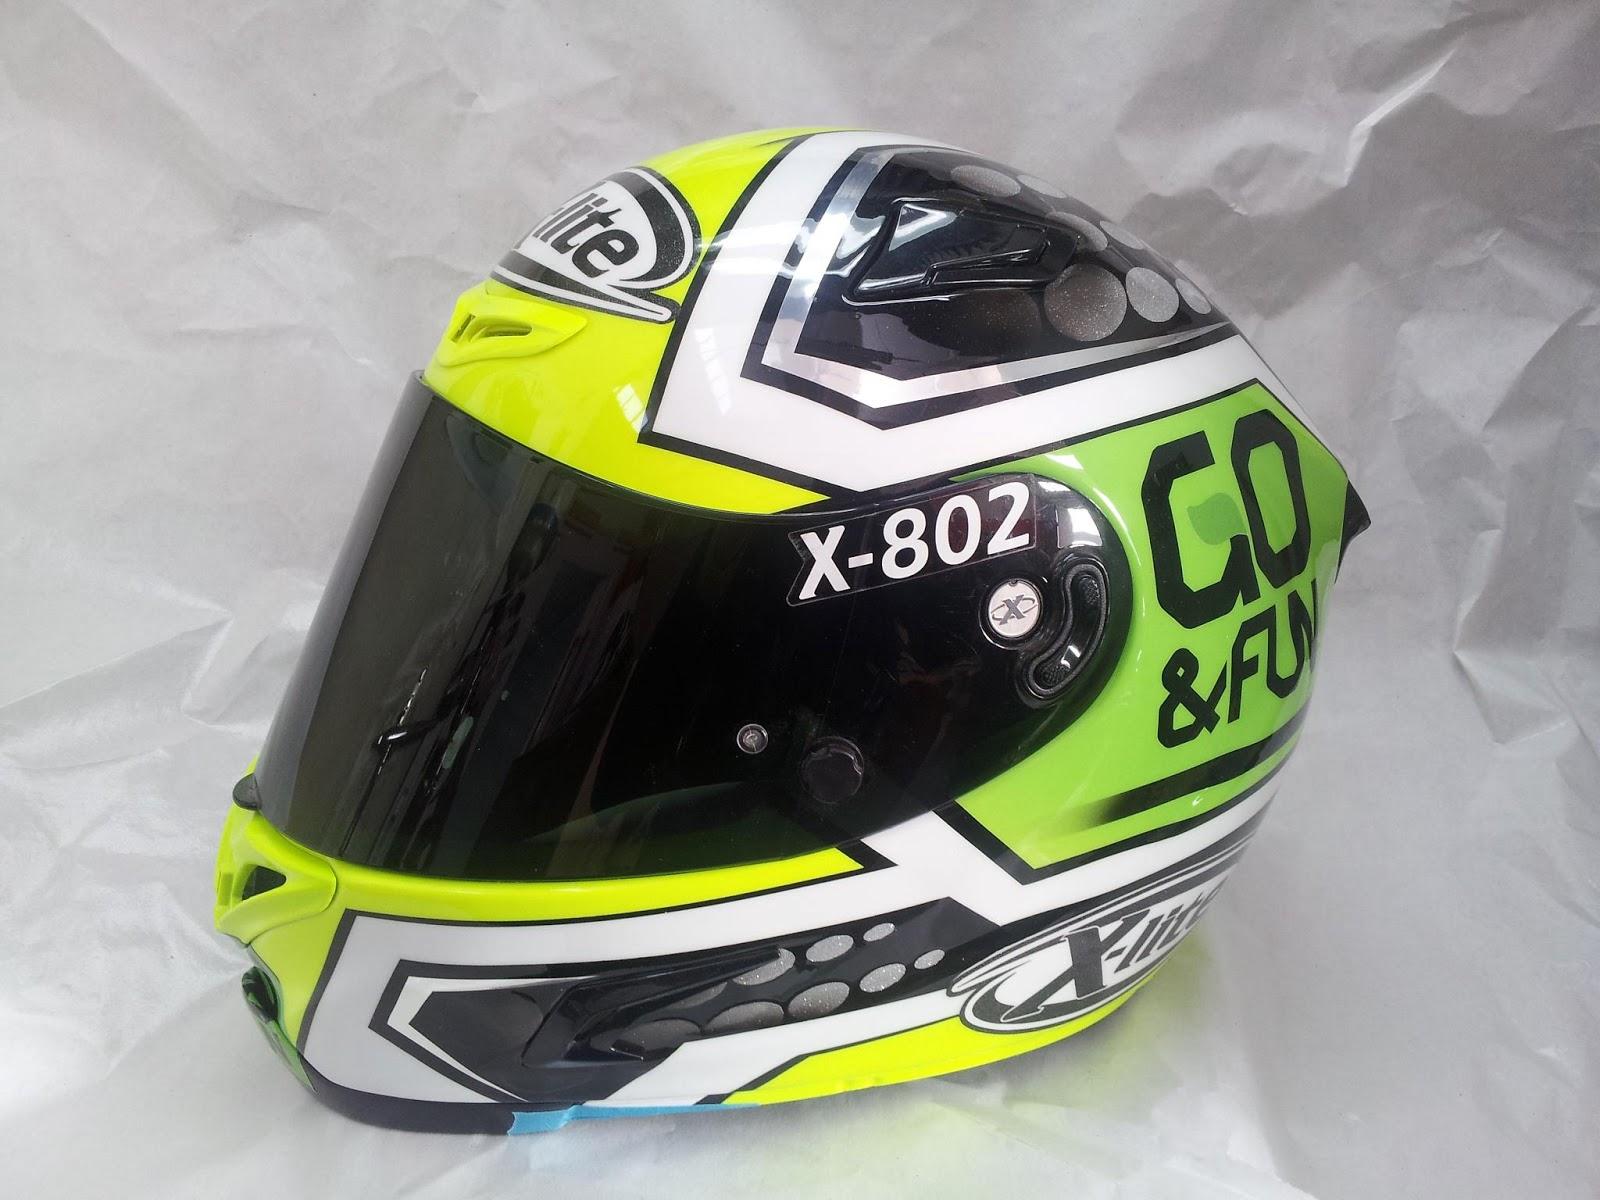 racing helmets garage x lite x 802r l baldassarri 2013 by. Black Bedroom Furniture Sets. Home Design Ideas